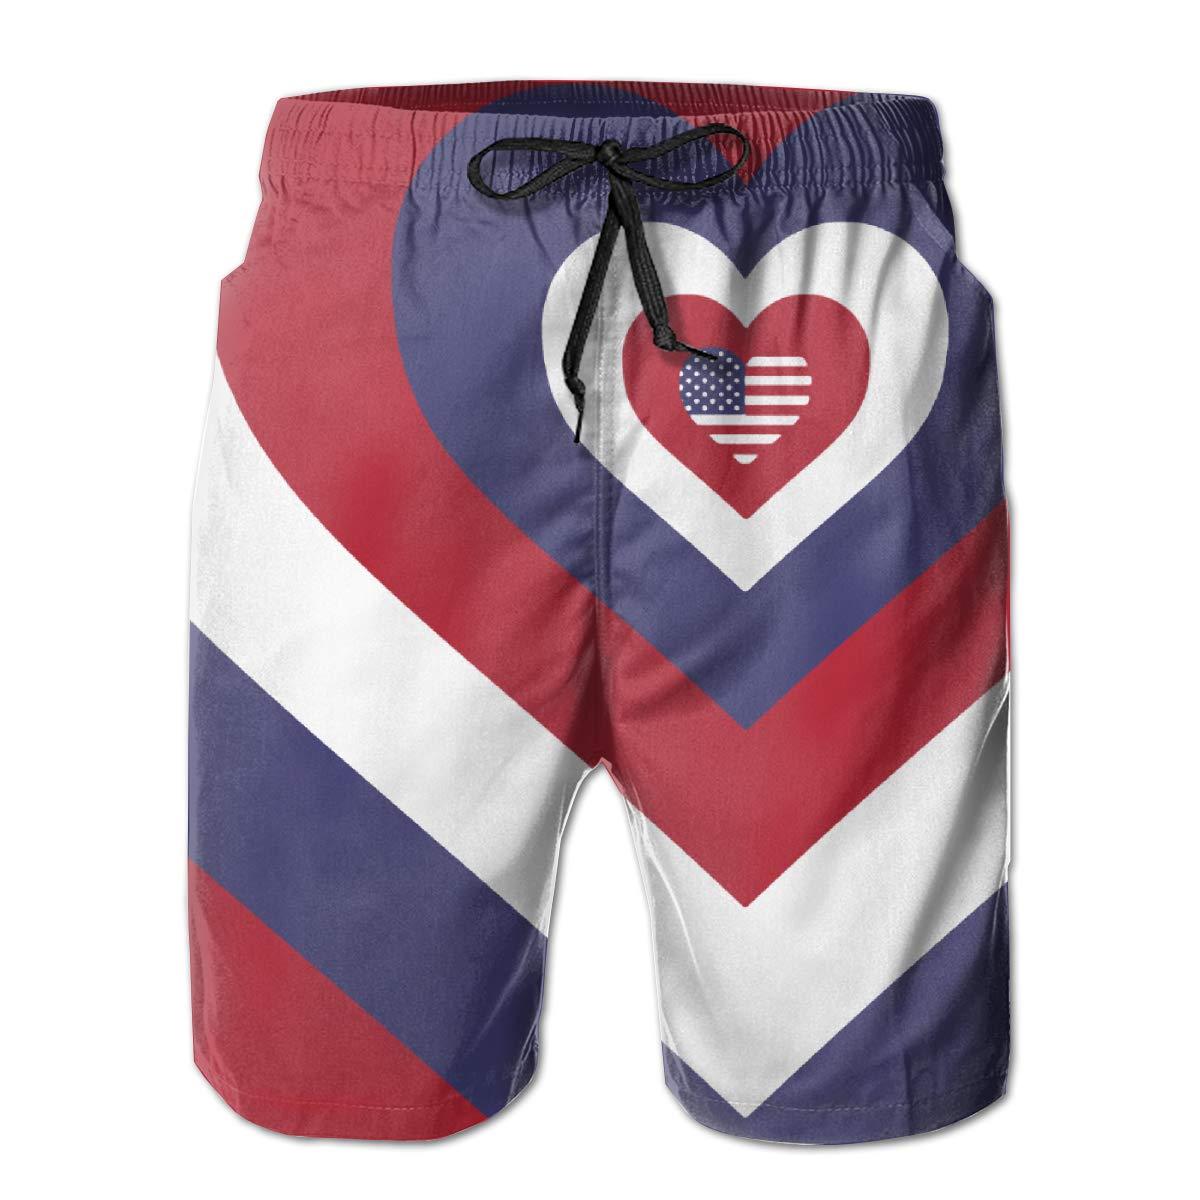 CCNXFGOK American Flag Hearts Boardshorts Mens Swimtrunks Fashion Beach Shorts Casual Shorts Swim Trunks